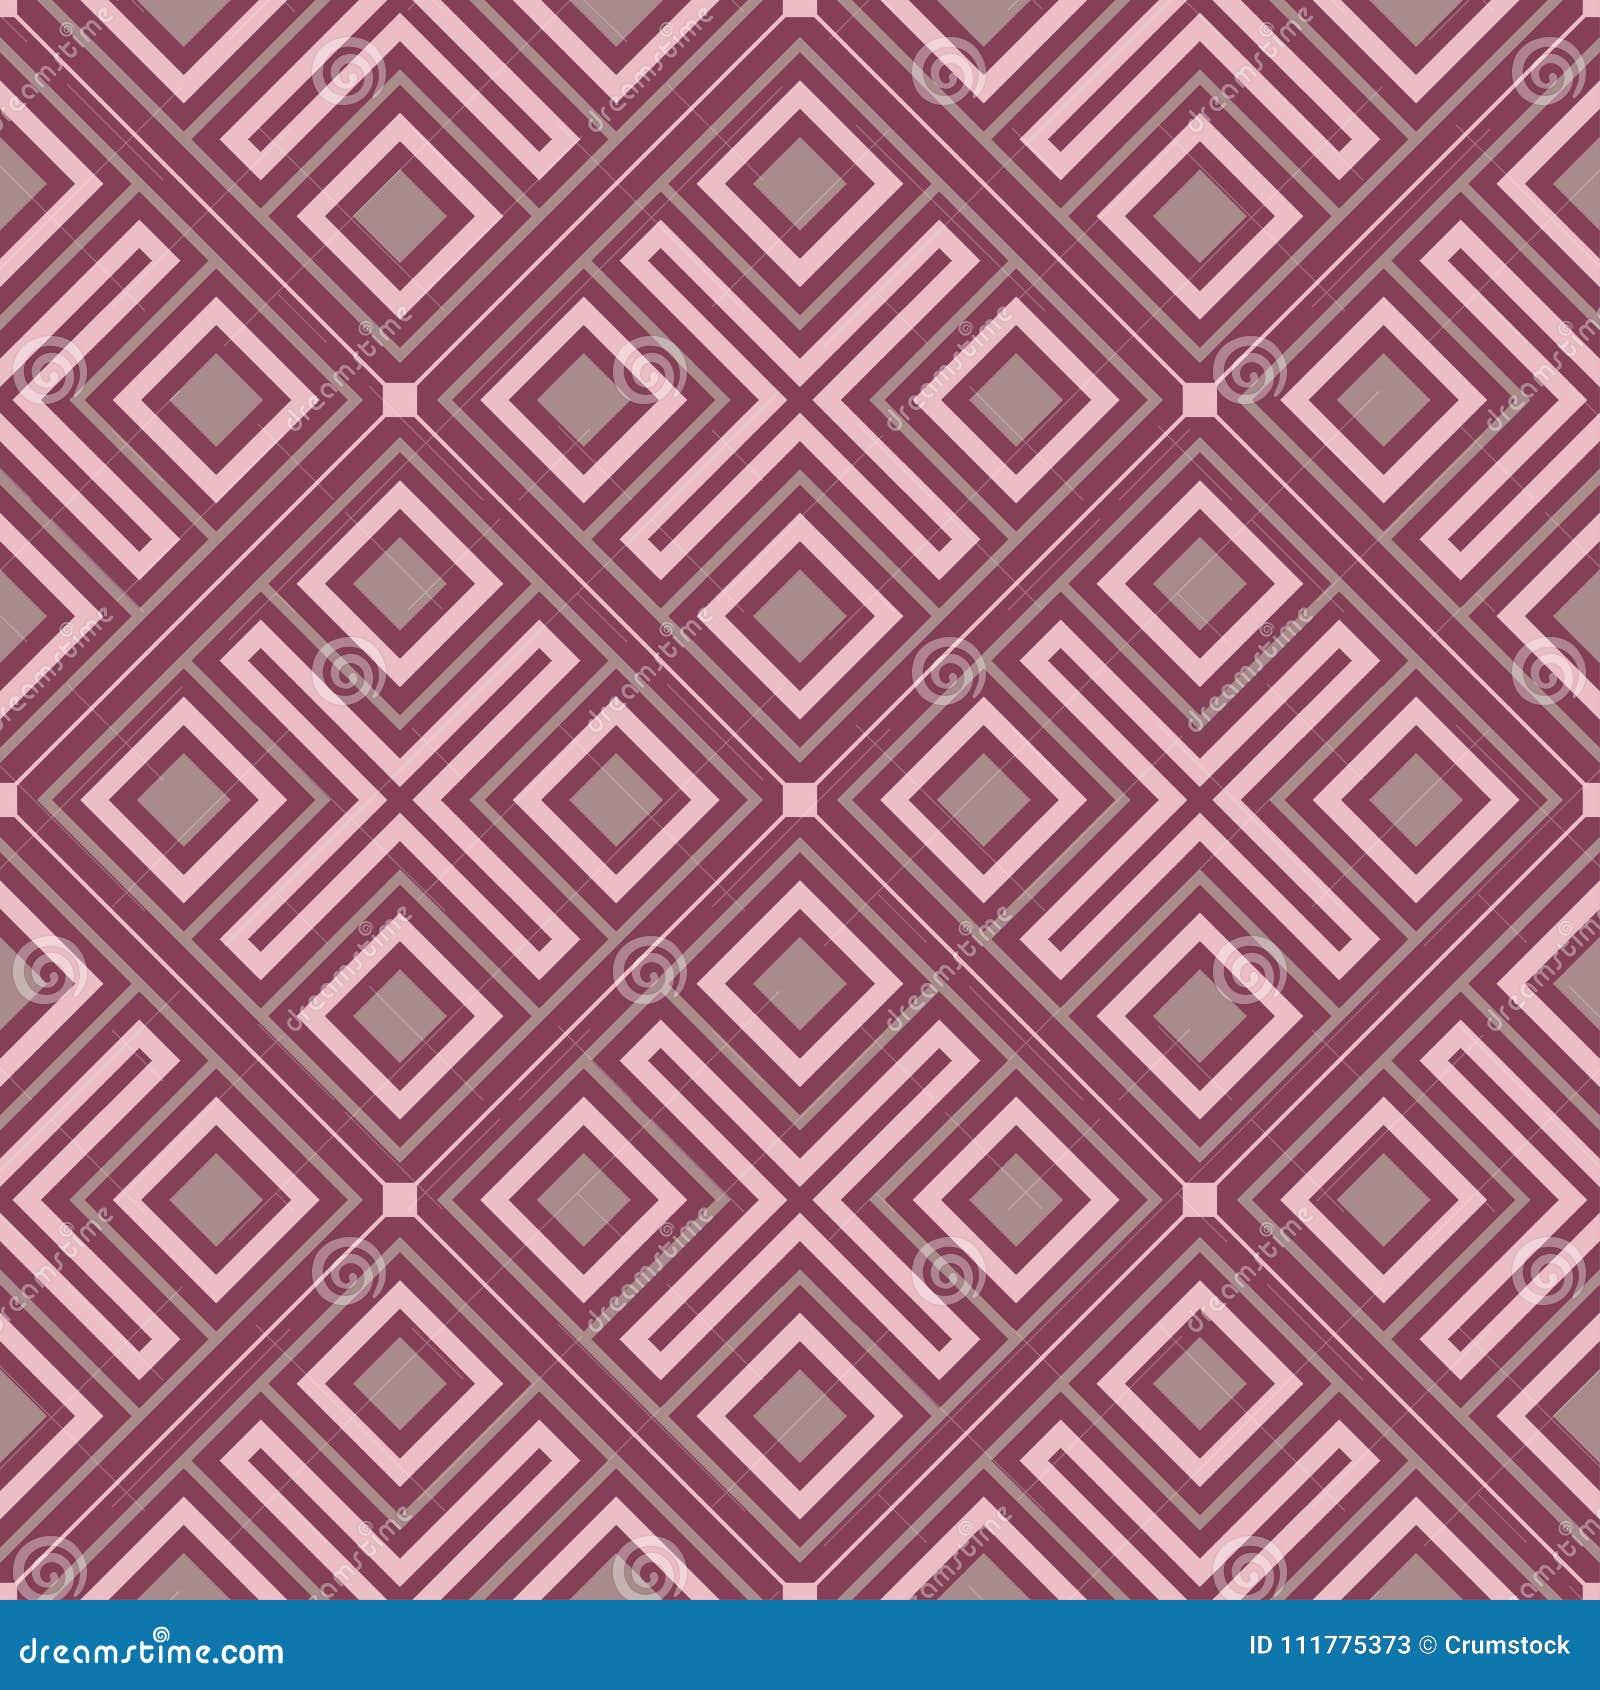 Purple red geometric seamless background. Dark deep red background